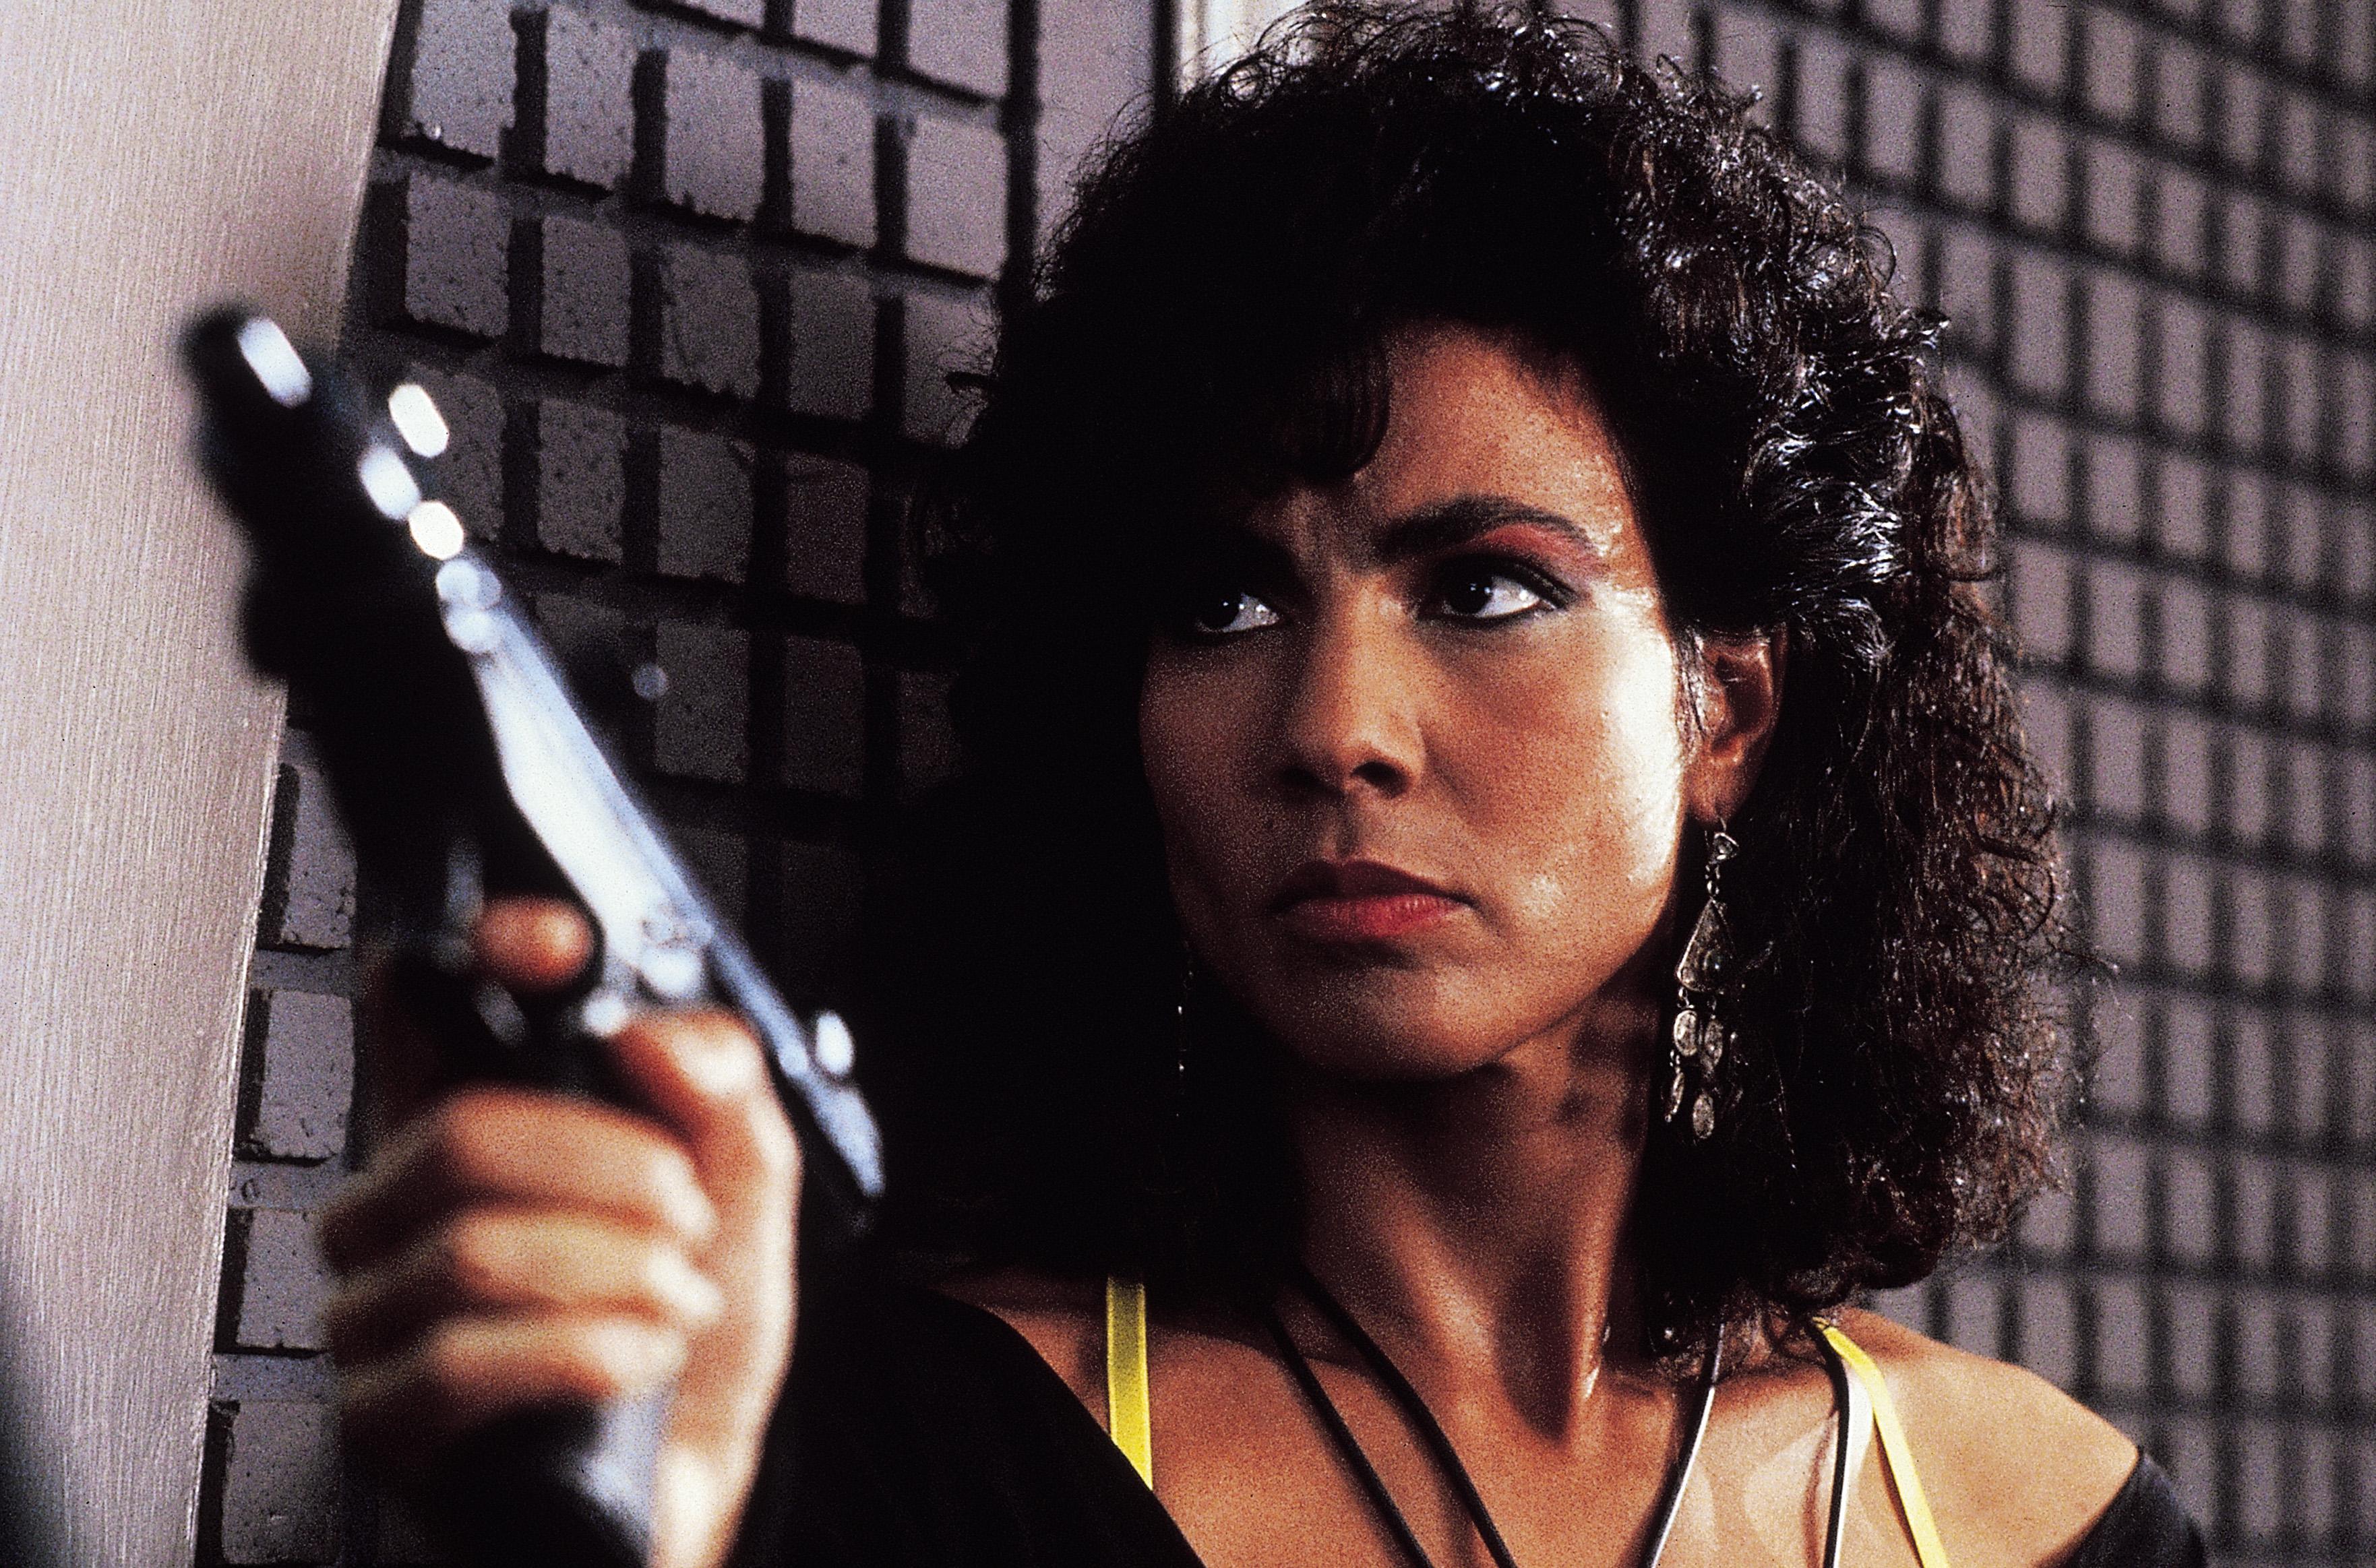 Rachel Ticotin in Total Recall (1990)